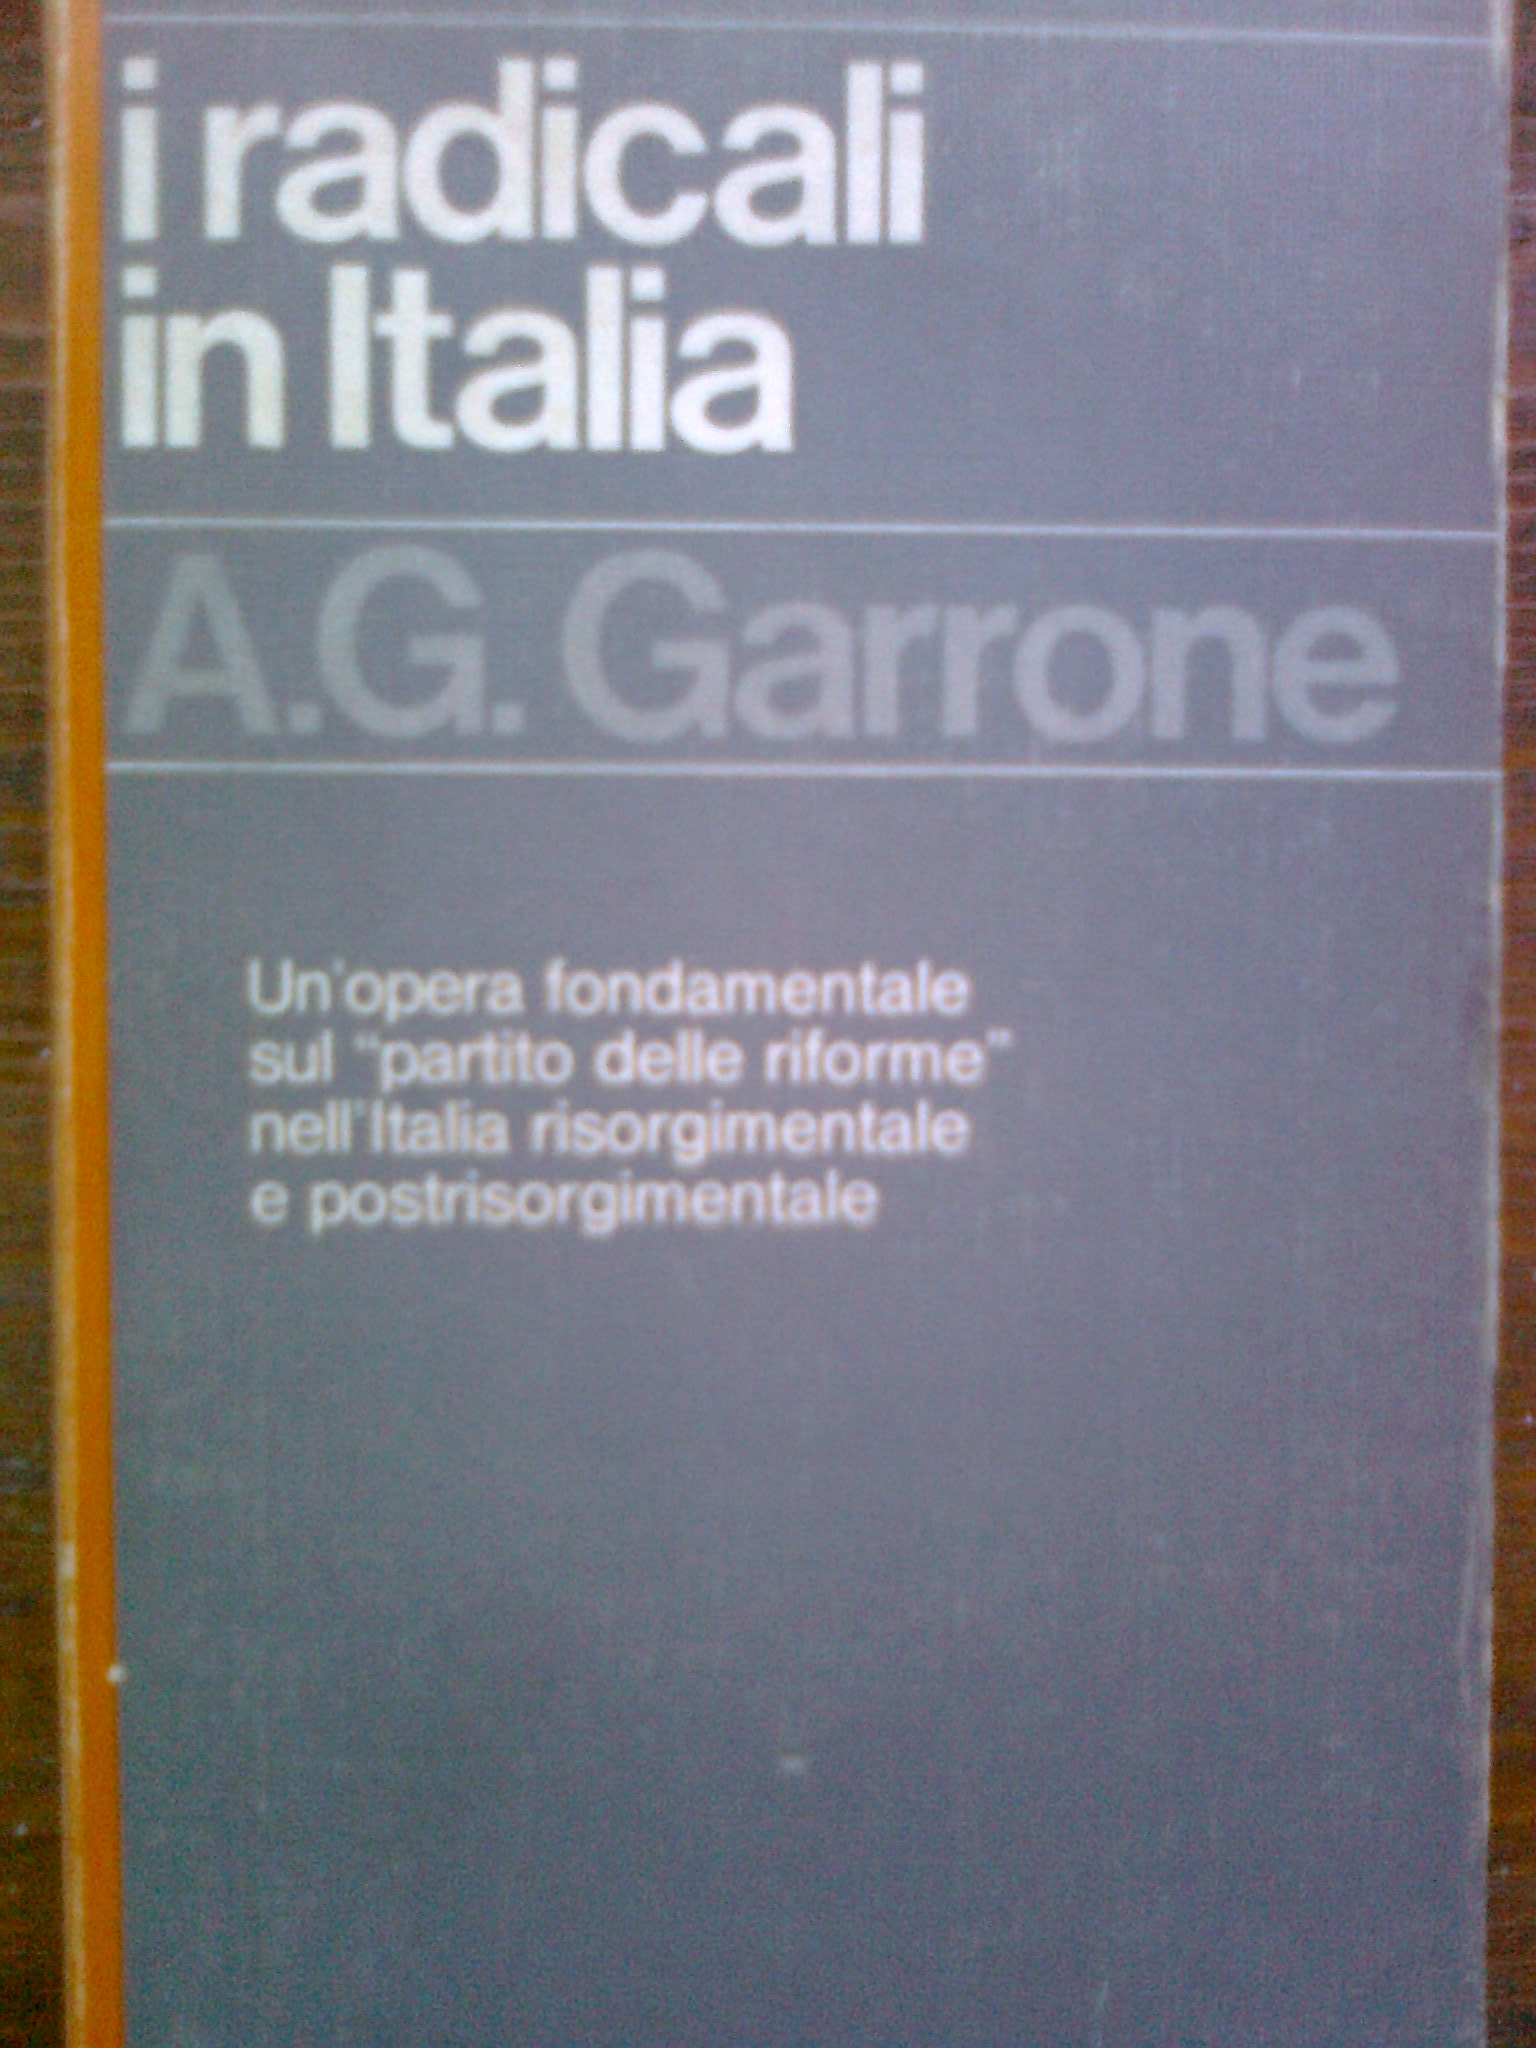 I radicali in italia